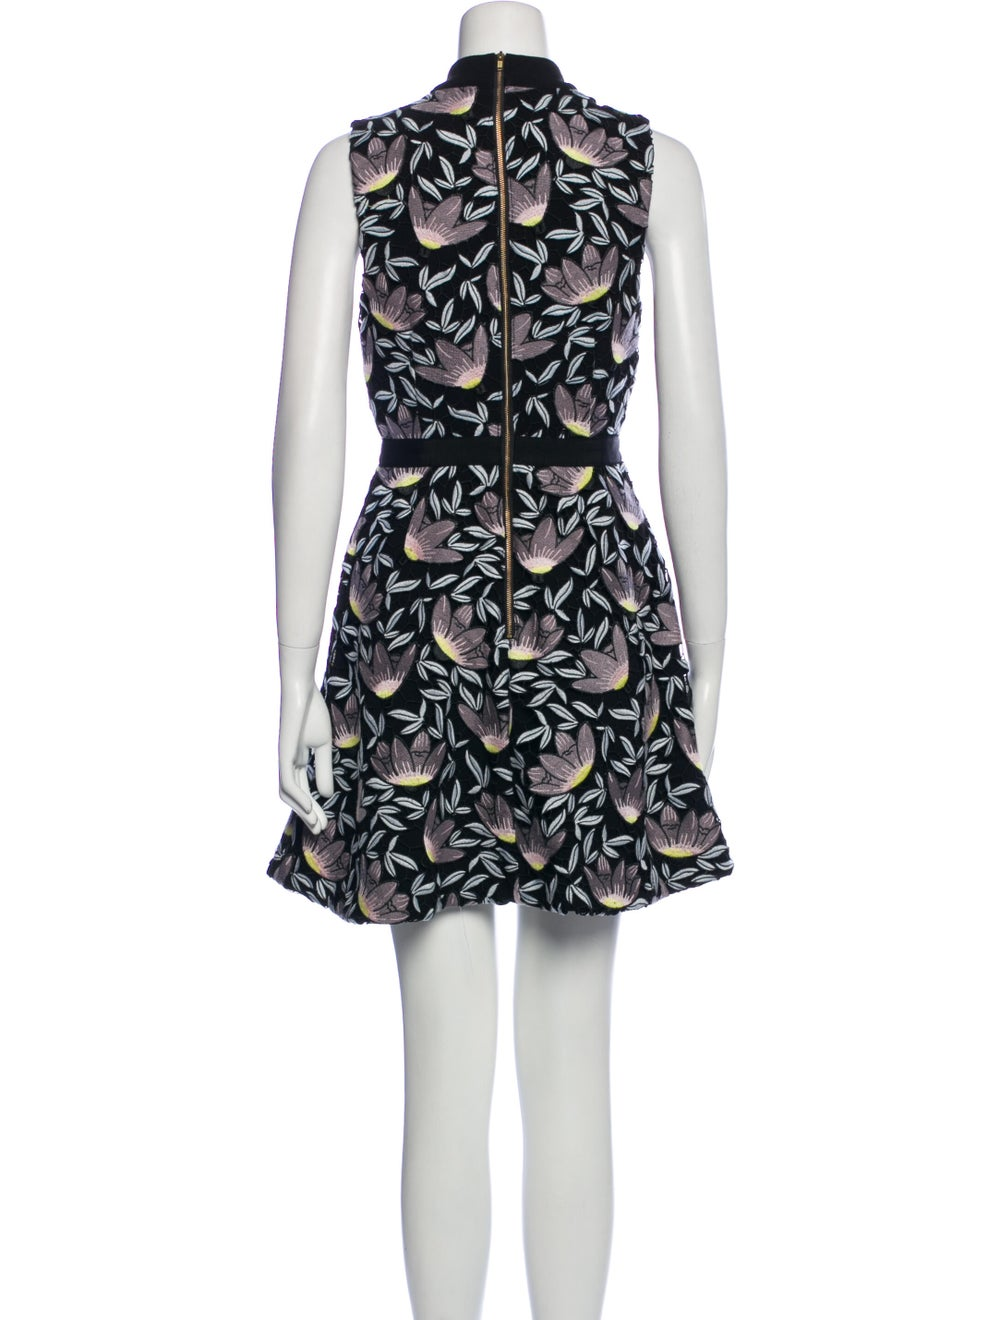 Self-Portrait Printed Mini Dress Black - image 3